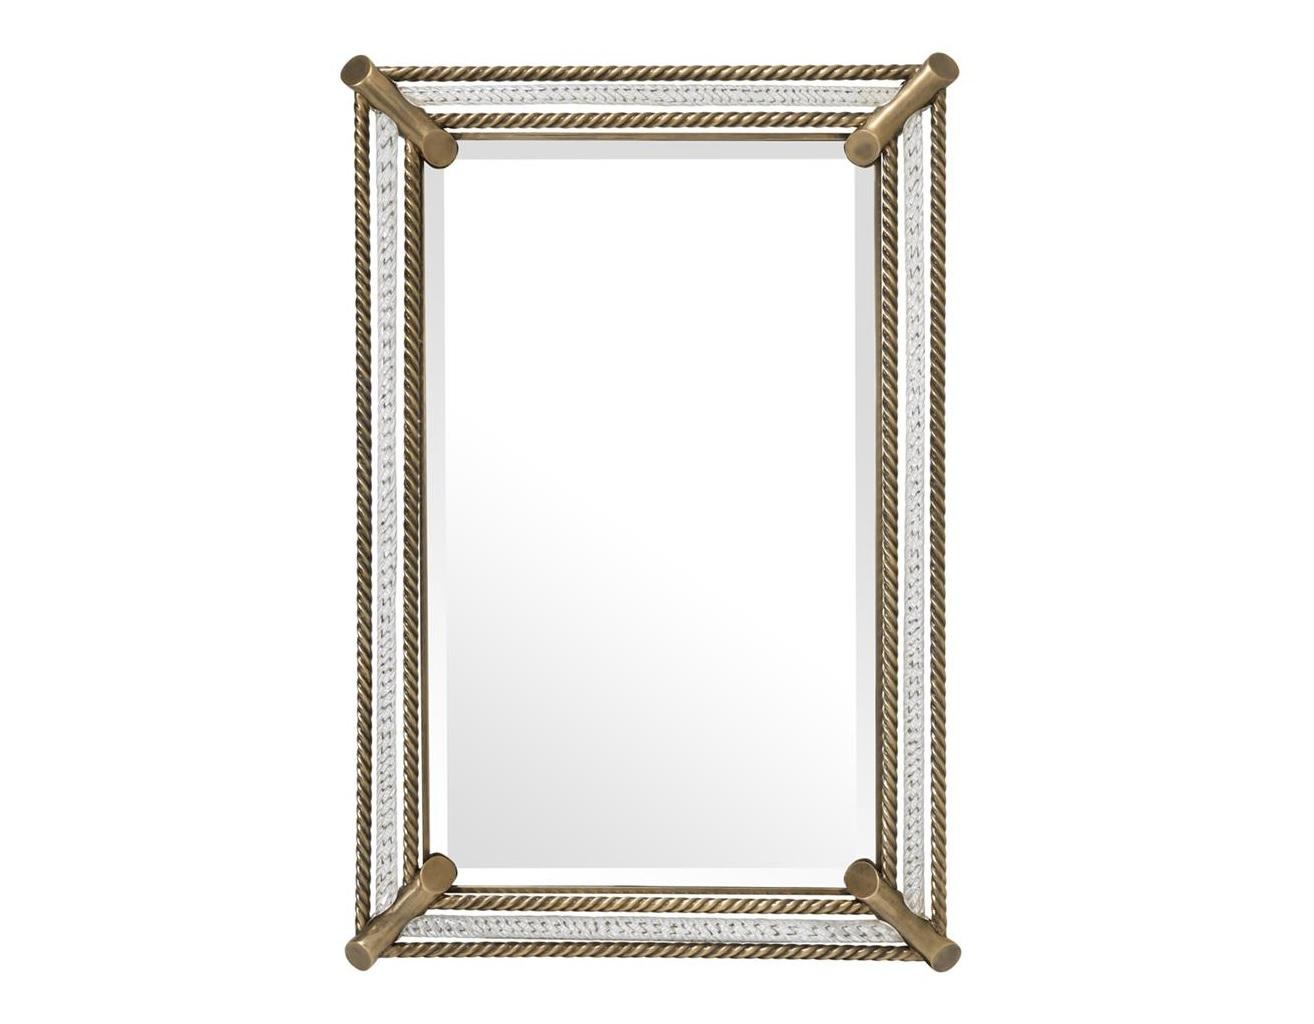 Зеркало Mirror CantoniНастенные зеркала<br><br><br>Material: Металл<br>Ширина см: 79<br>Высота см: 107<br>Глубина см: 3